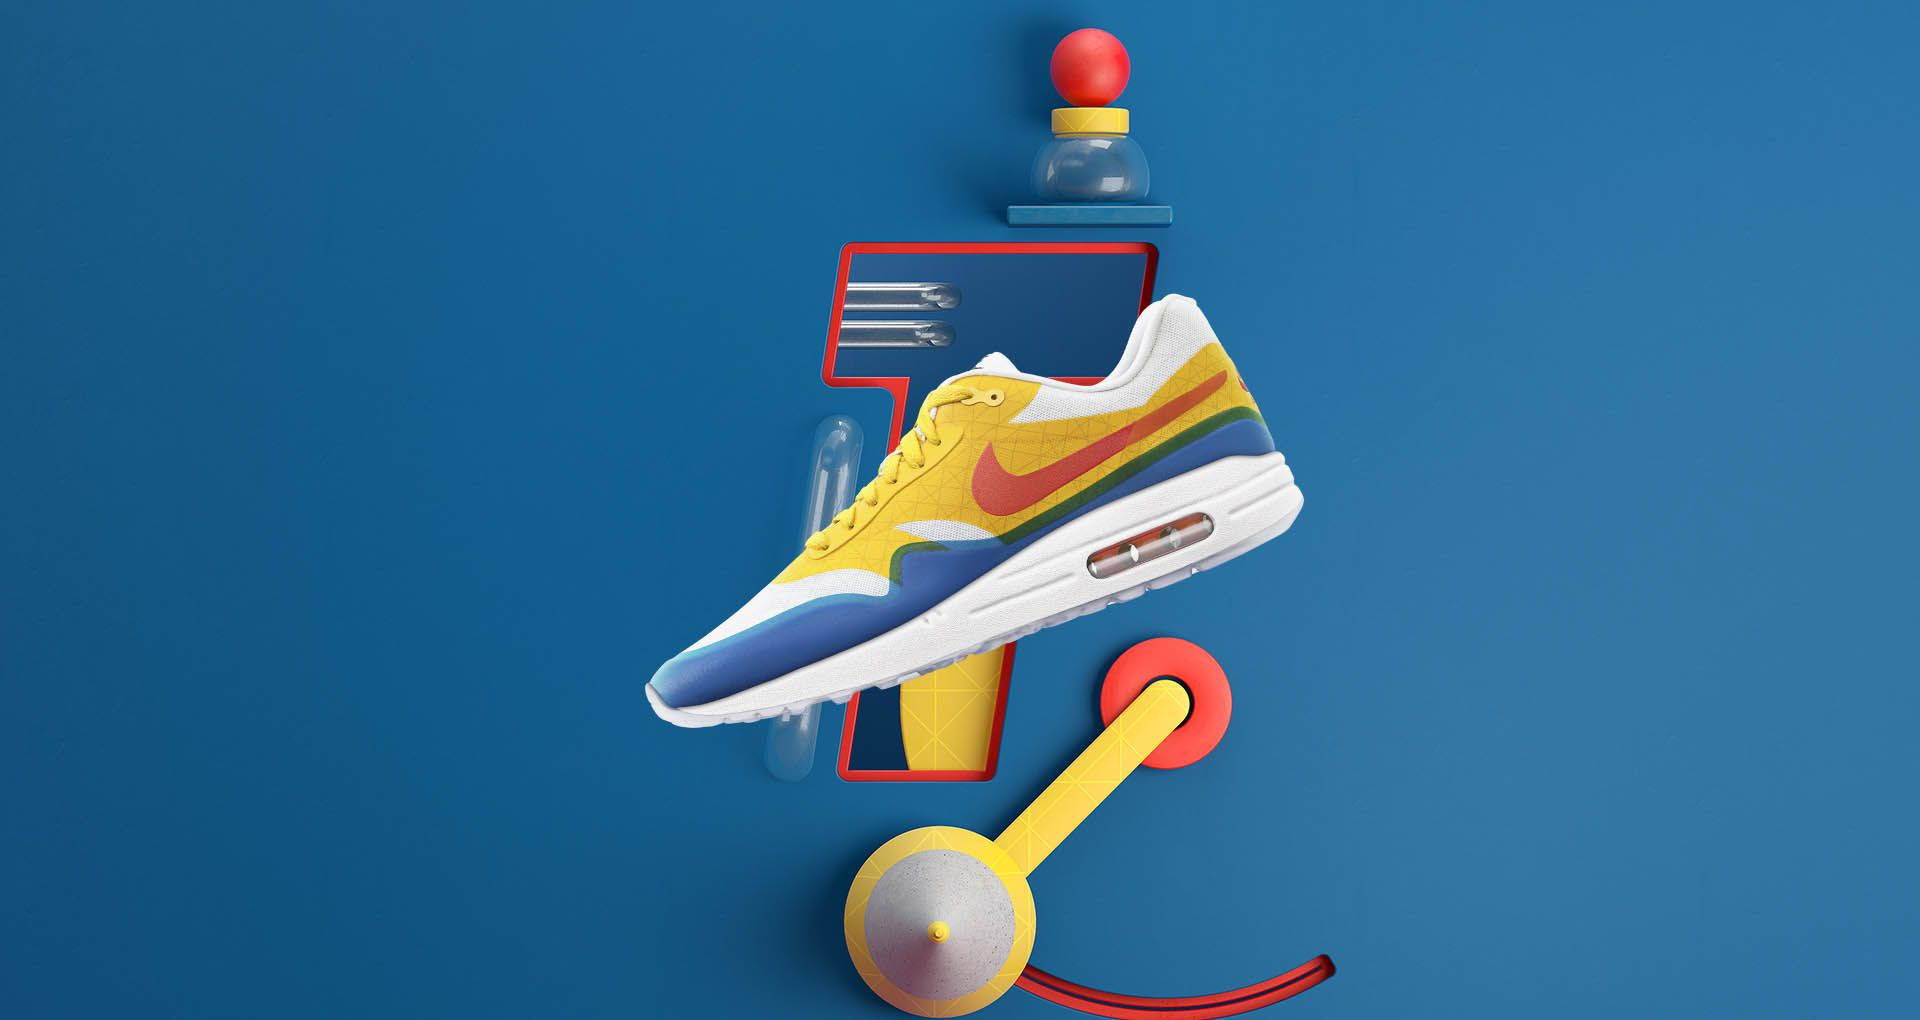 Nike Air Max 1 HTM iD Tinker Hatfield   WAVE®